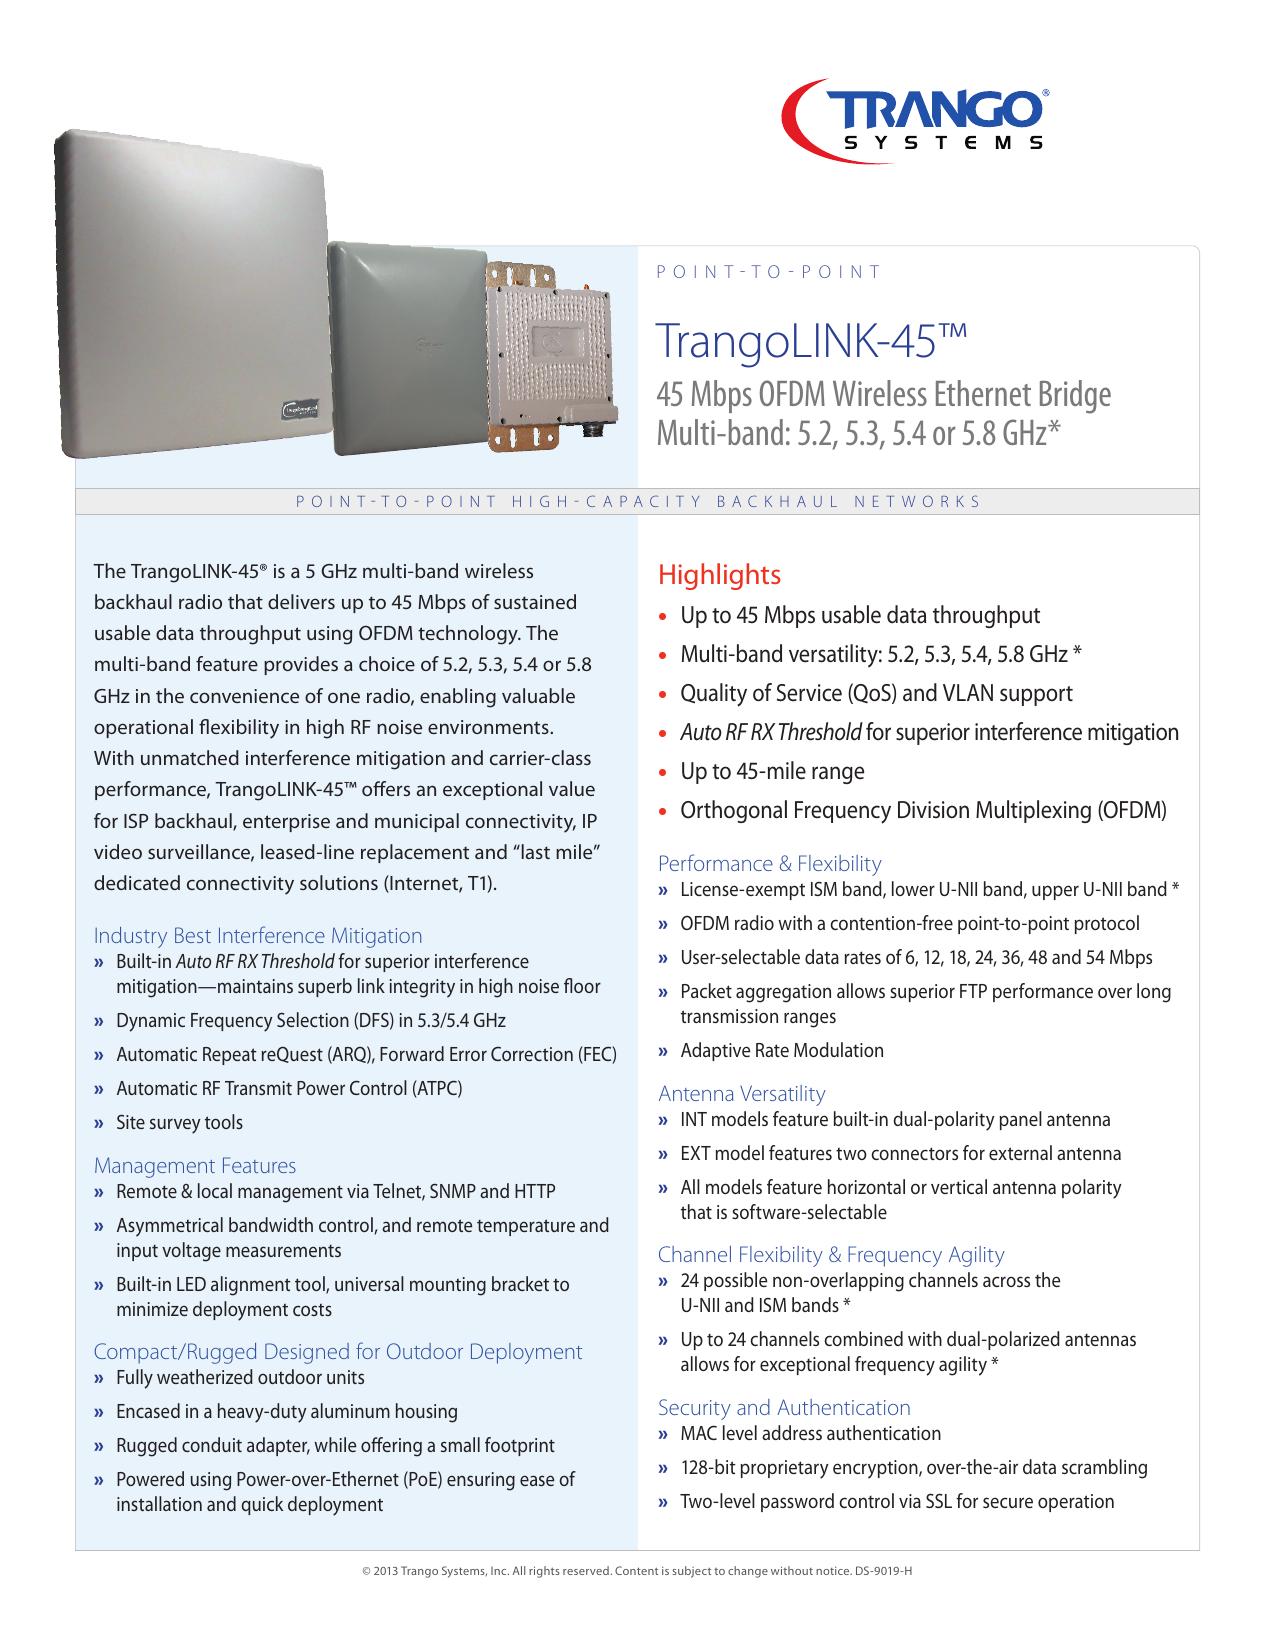 TrangoLINK-45 Multi-Band 5 x GHz OFDM Wireless Ethernet